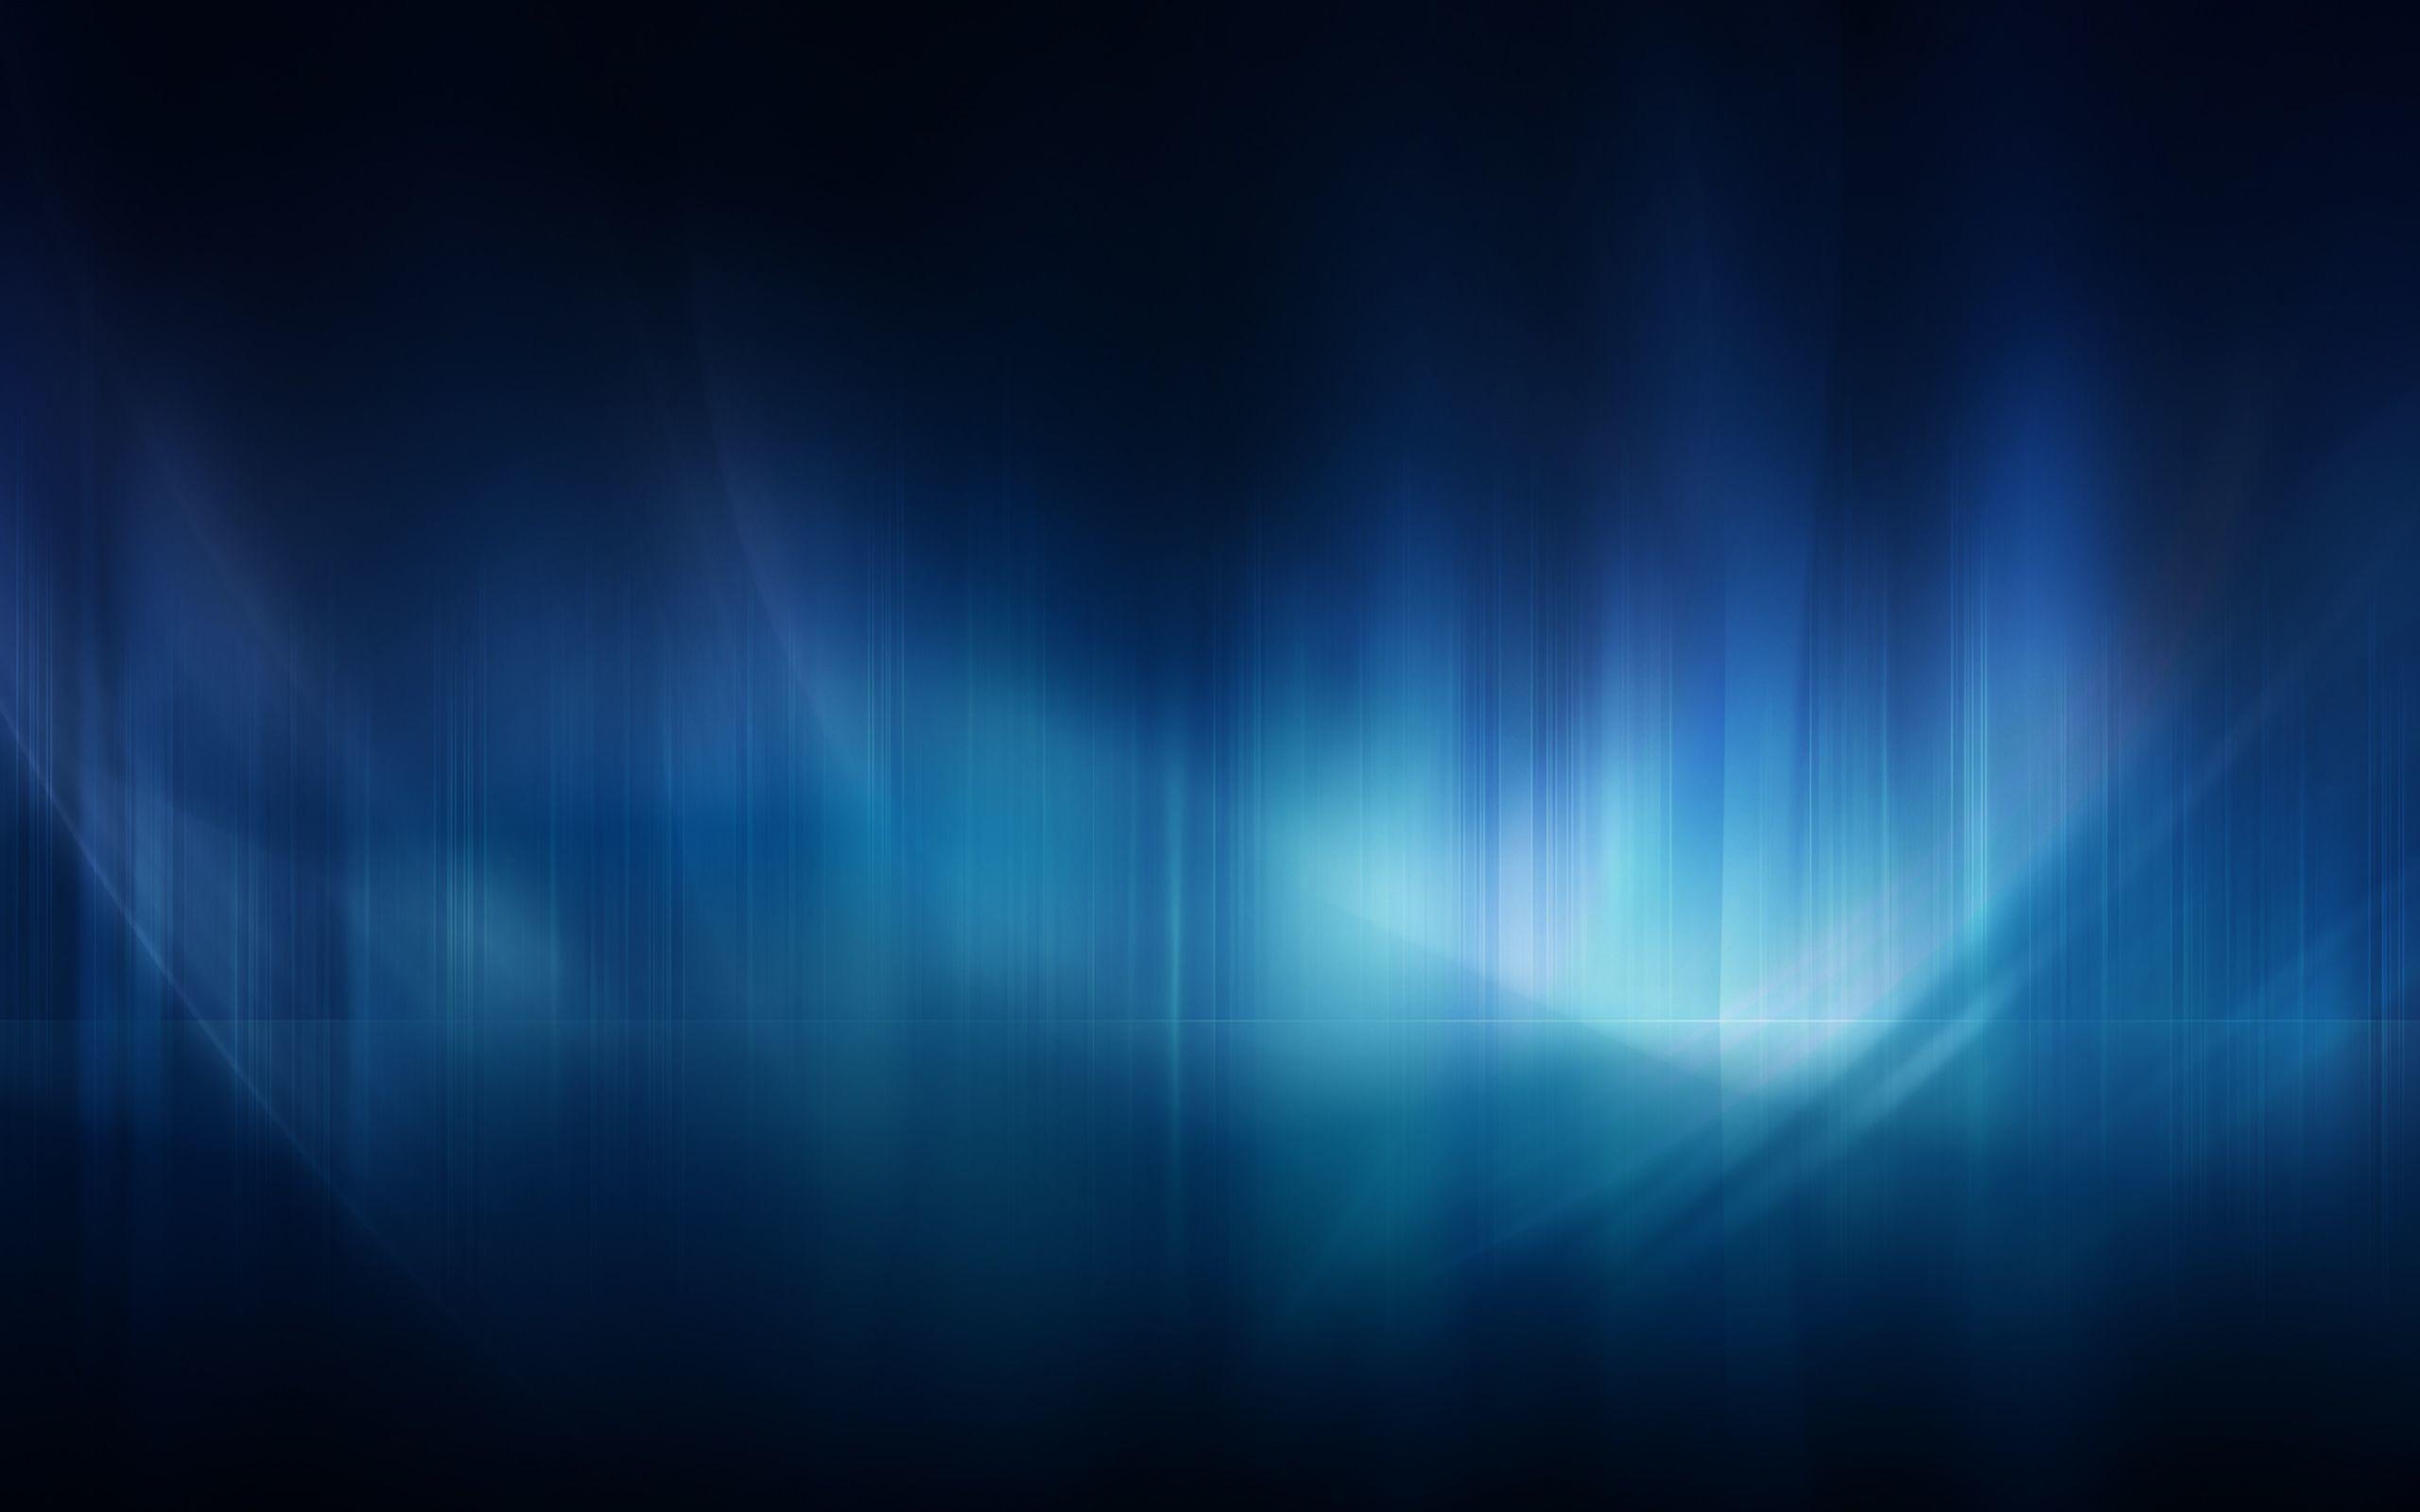 Black-and-Blue-Wallpaper-HD